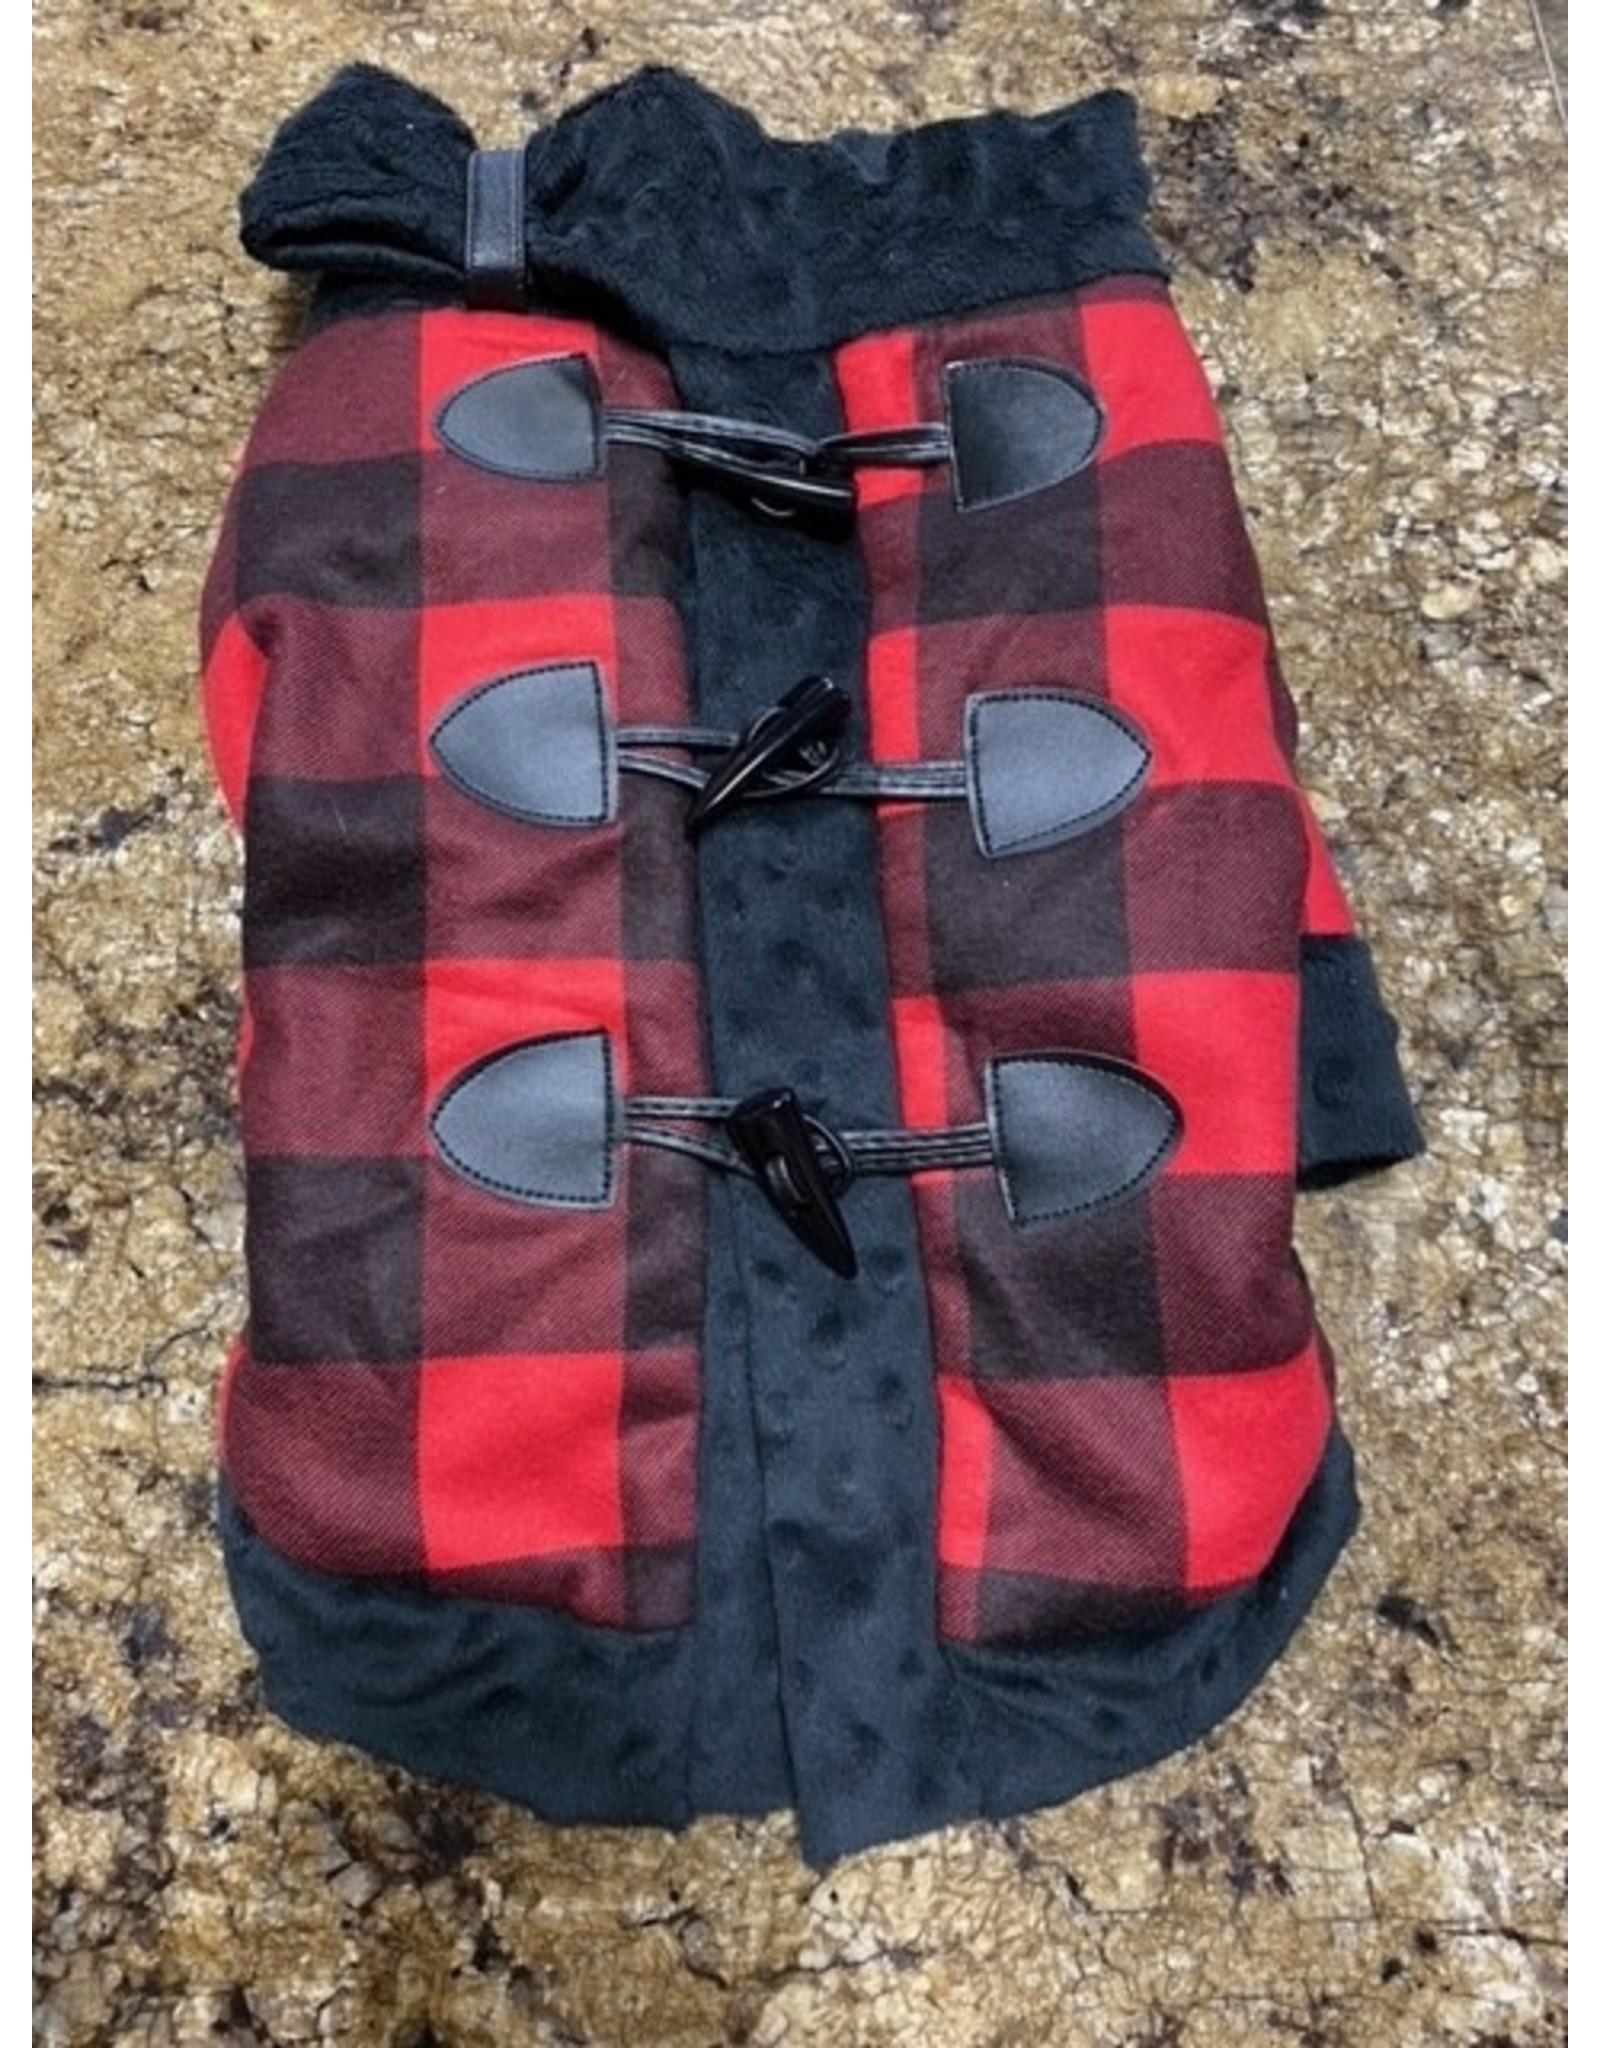 Ruff-Stitched Red Plaid Toggle Coat - Small